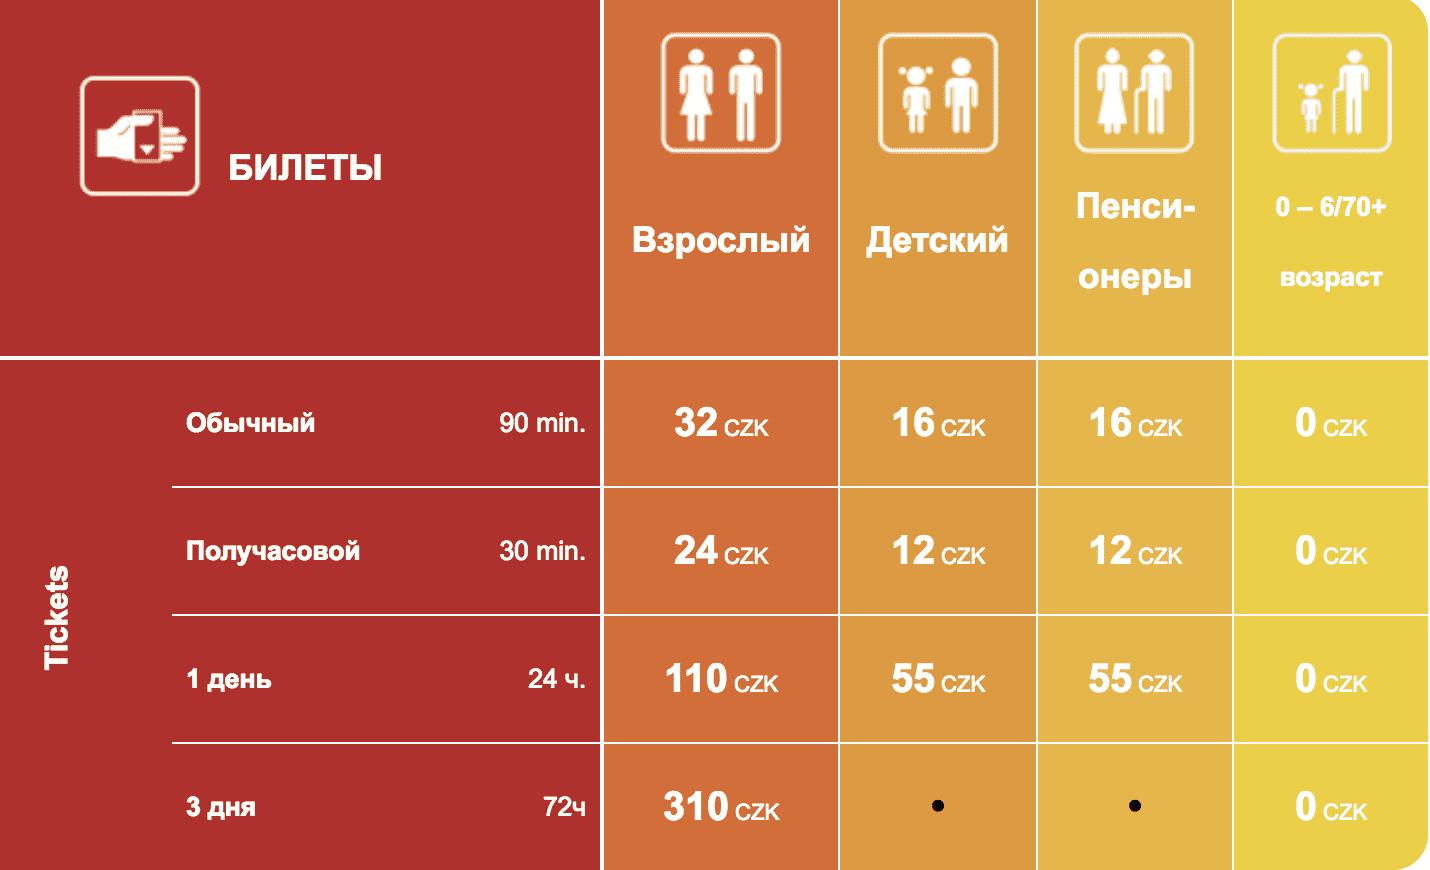 Билеты в метро Праги